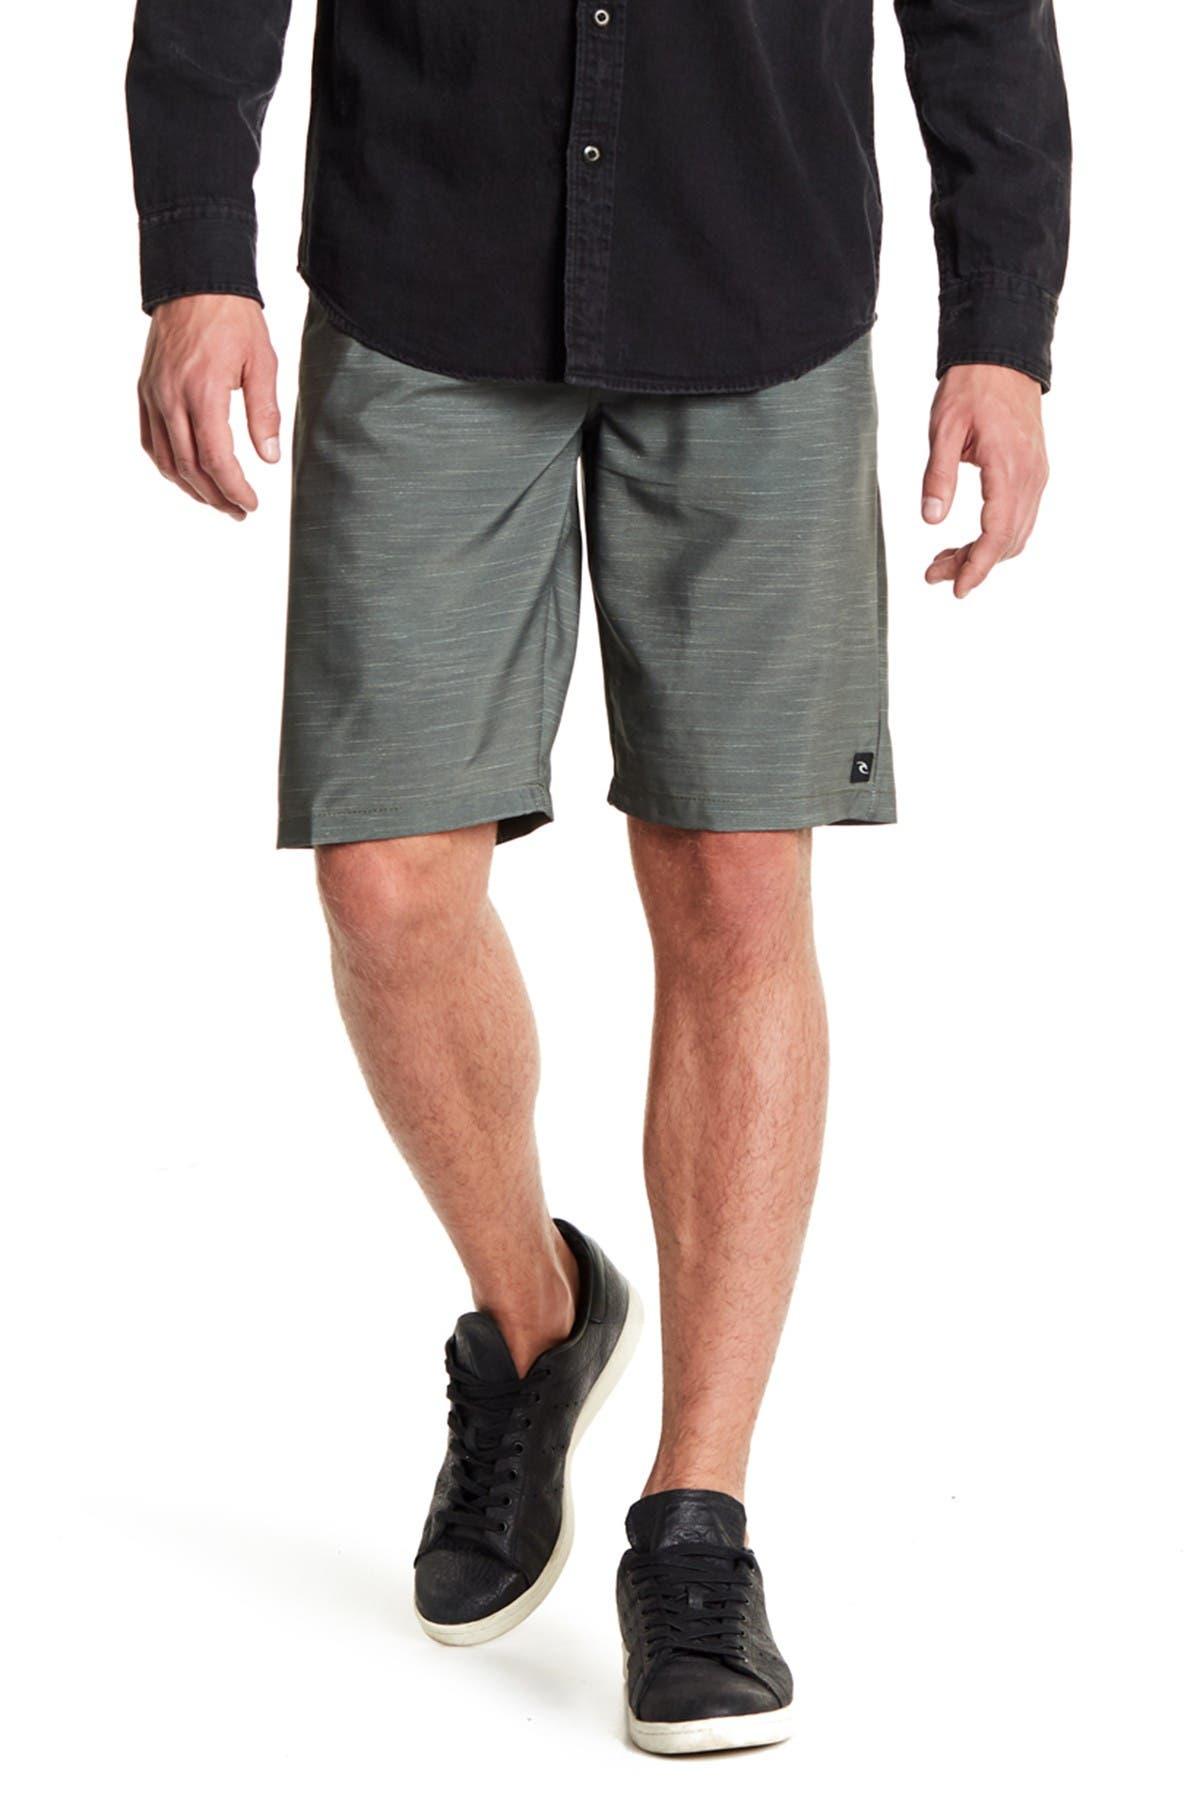 Image of Rip Curl Jackson Boardwalk Shorts